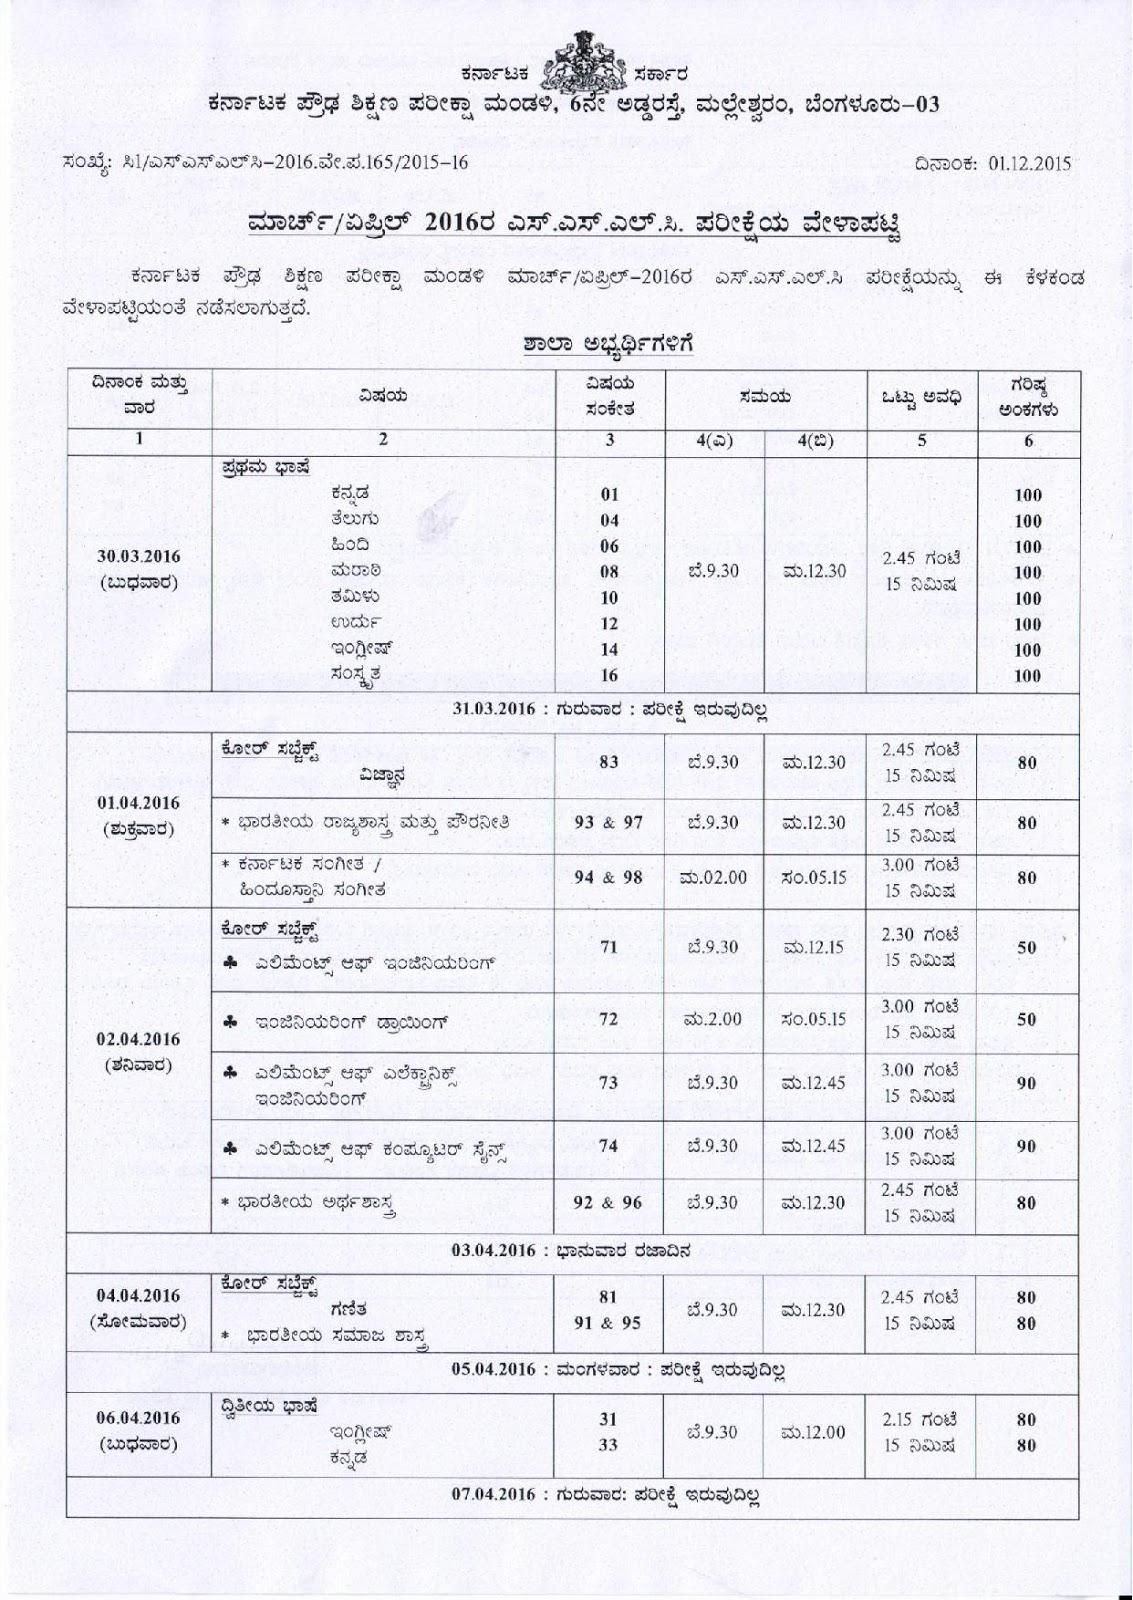 Karnataka sslc model question papers blue print 2015 16 karnataka board sslc time table 2016 marchapril malvernweather Image collections